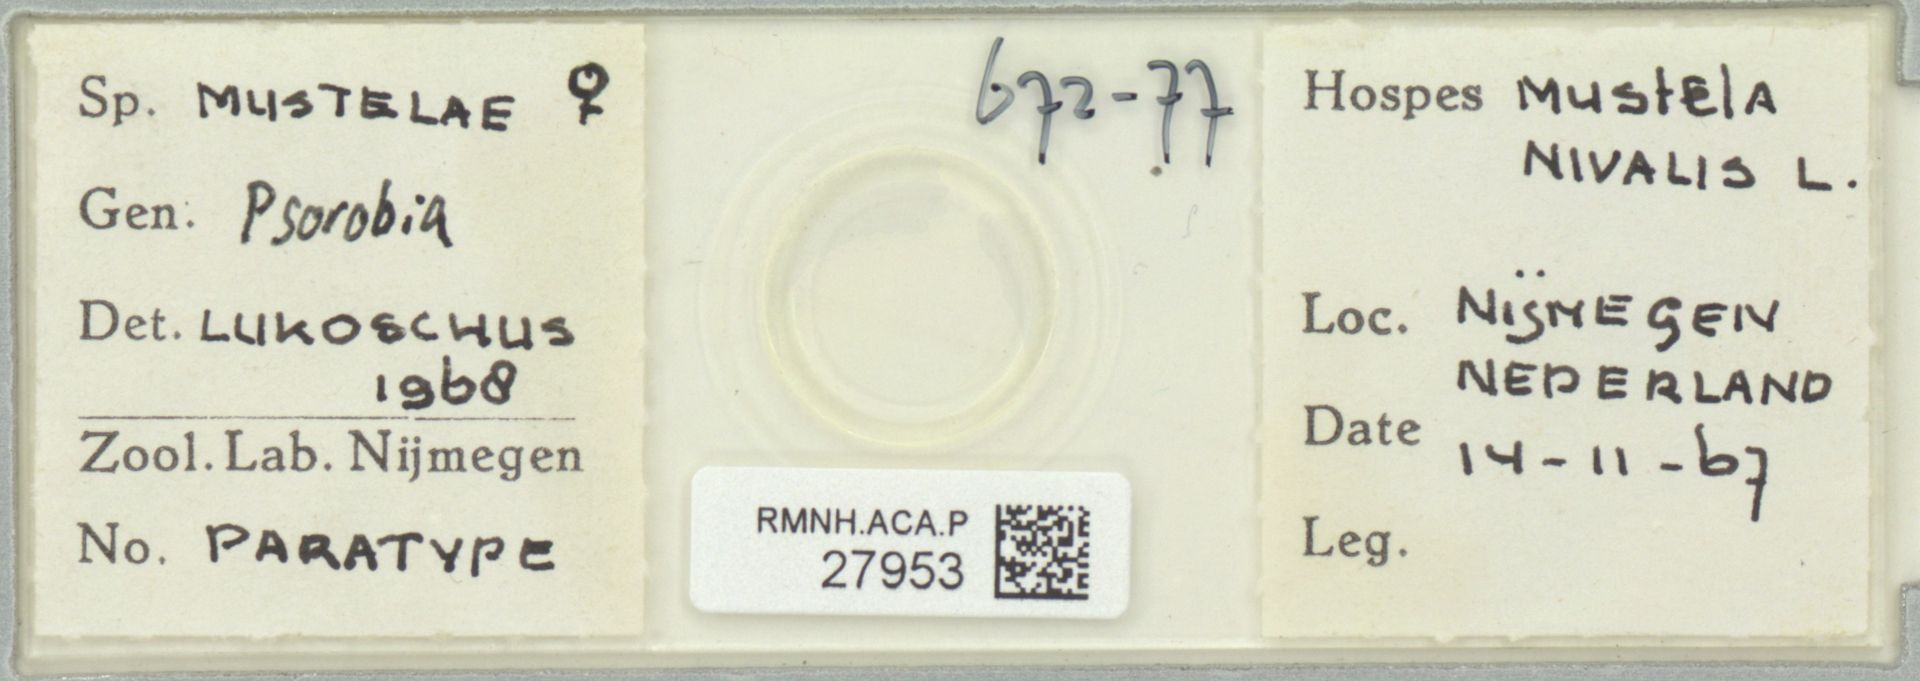 RMNH.ACA.P.27953 | Psorobia mustelae Lukoschus 1968